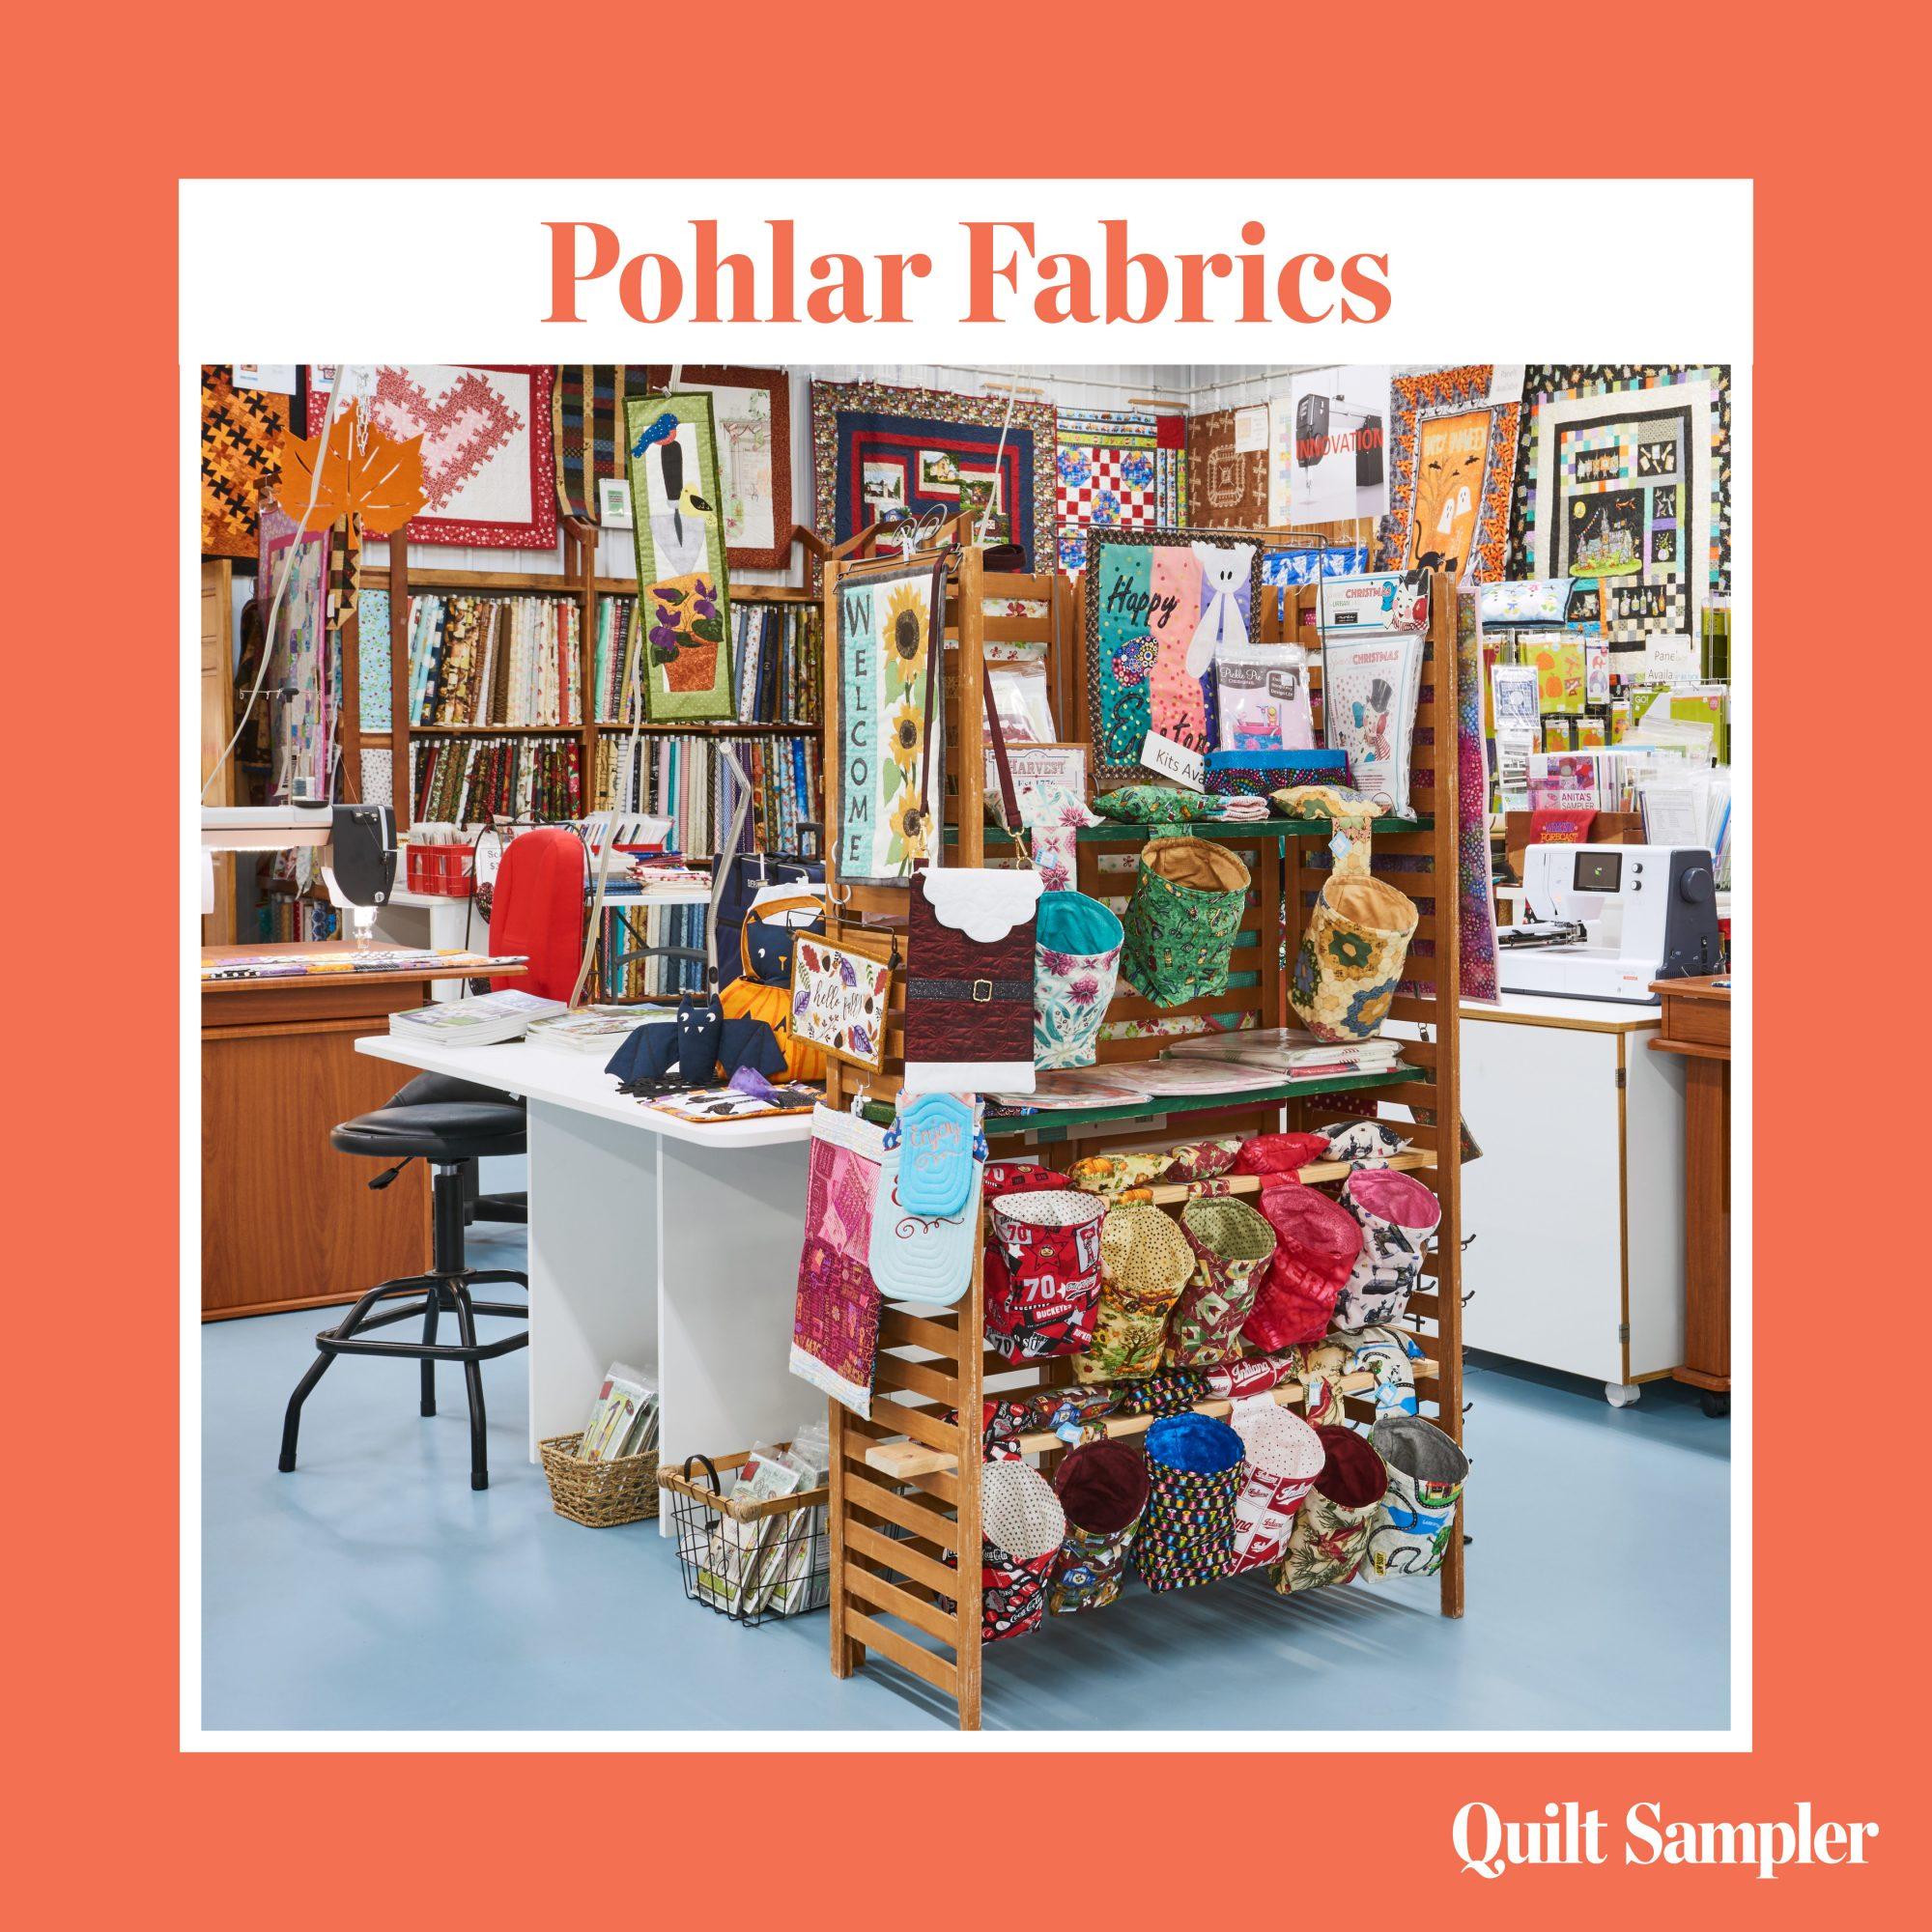 Pohlar Fabrics